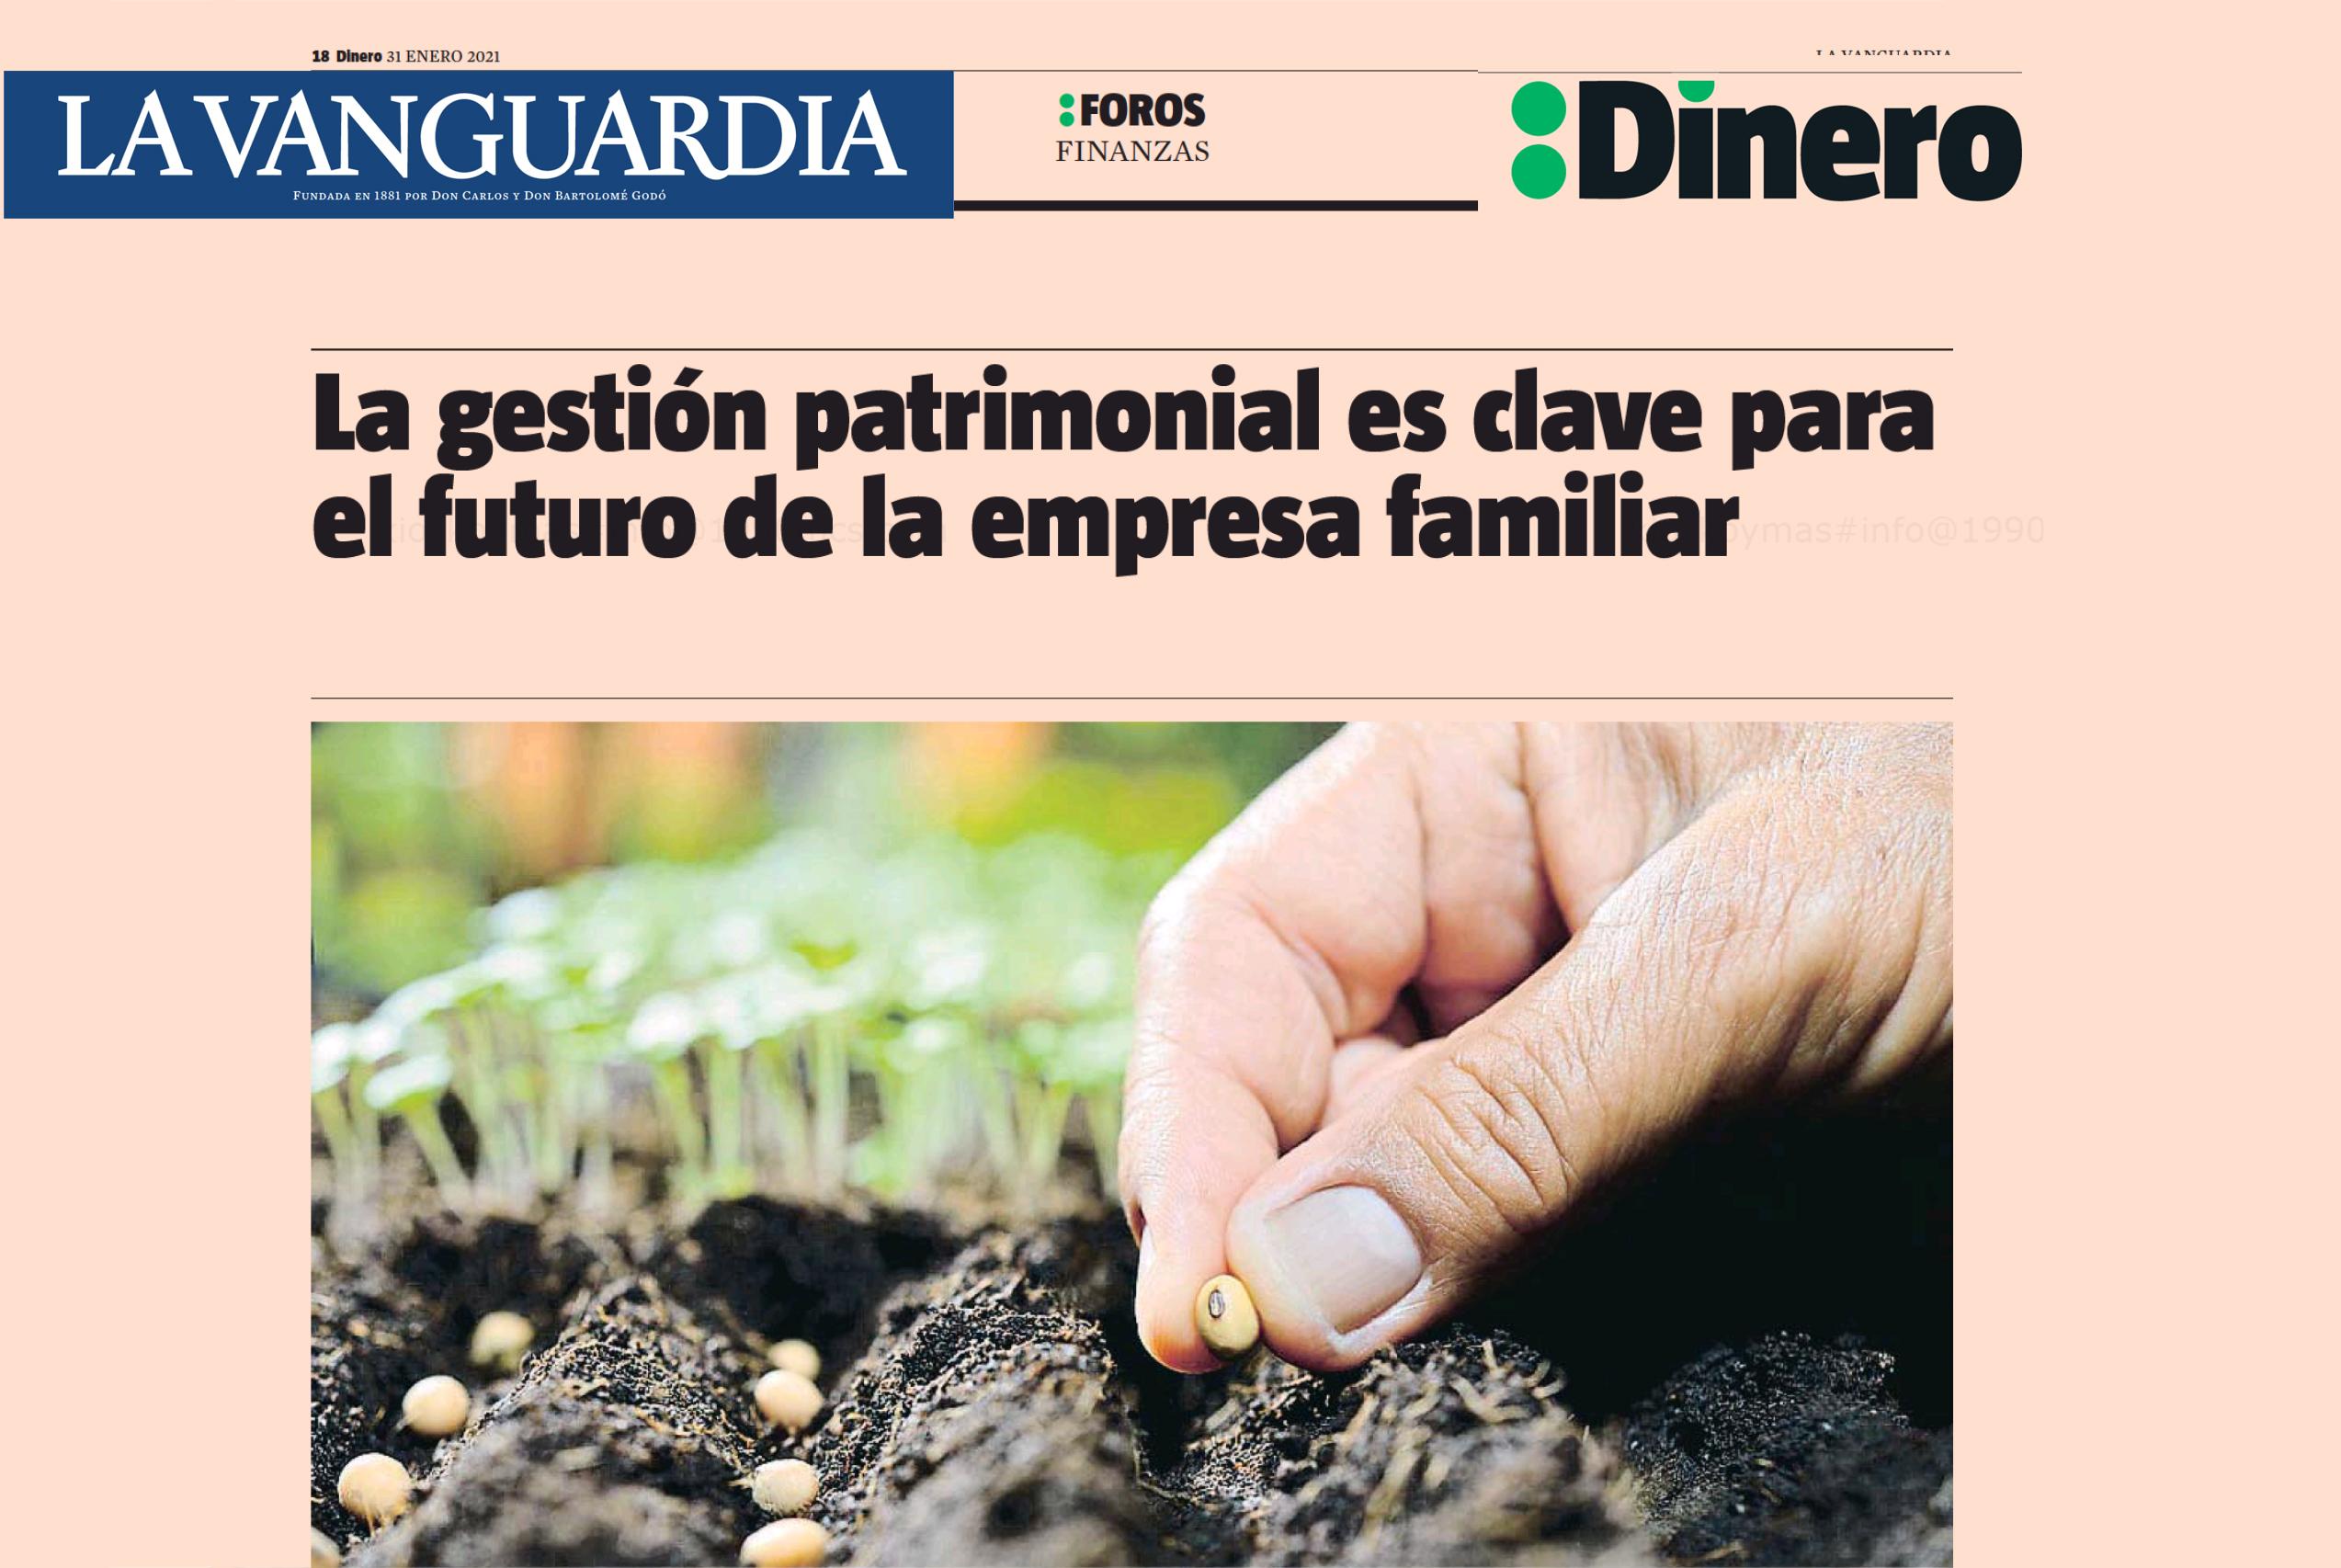 Gestió patrimonial - Dinero La Vanguardia